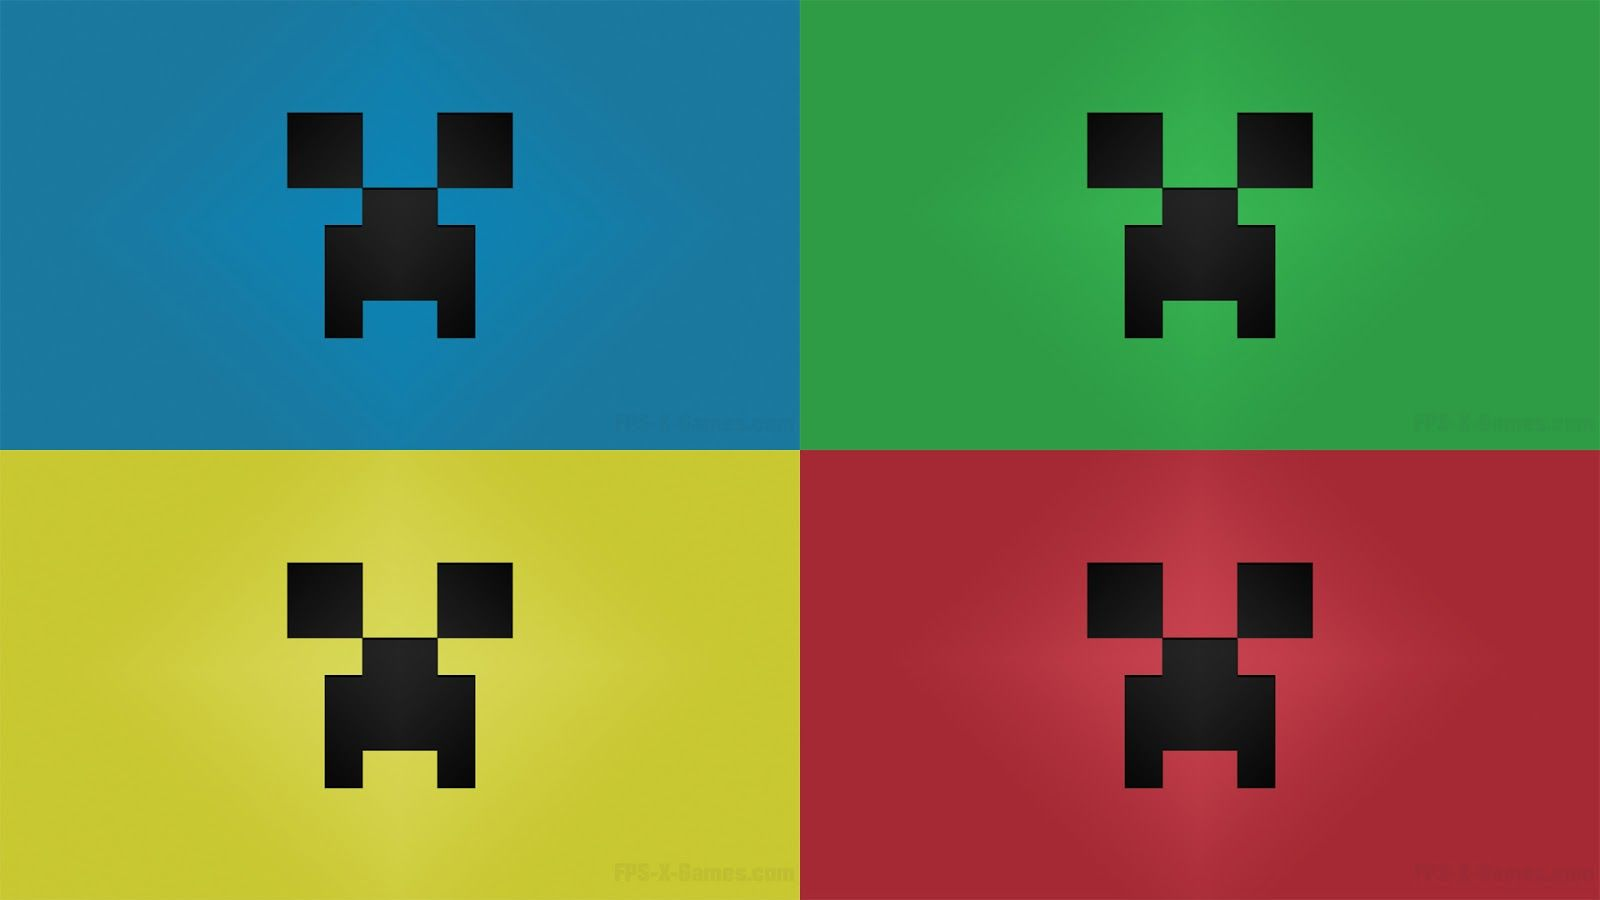 Primary Color Minecraft Desktop Creeper Wallpaper 1920 X 1080 Pixels Minecraft Wallpaper Creeper Minecraft Minecraft Pixel Art